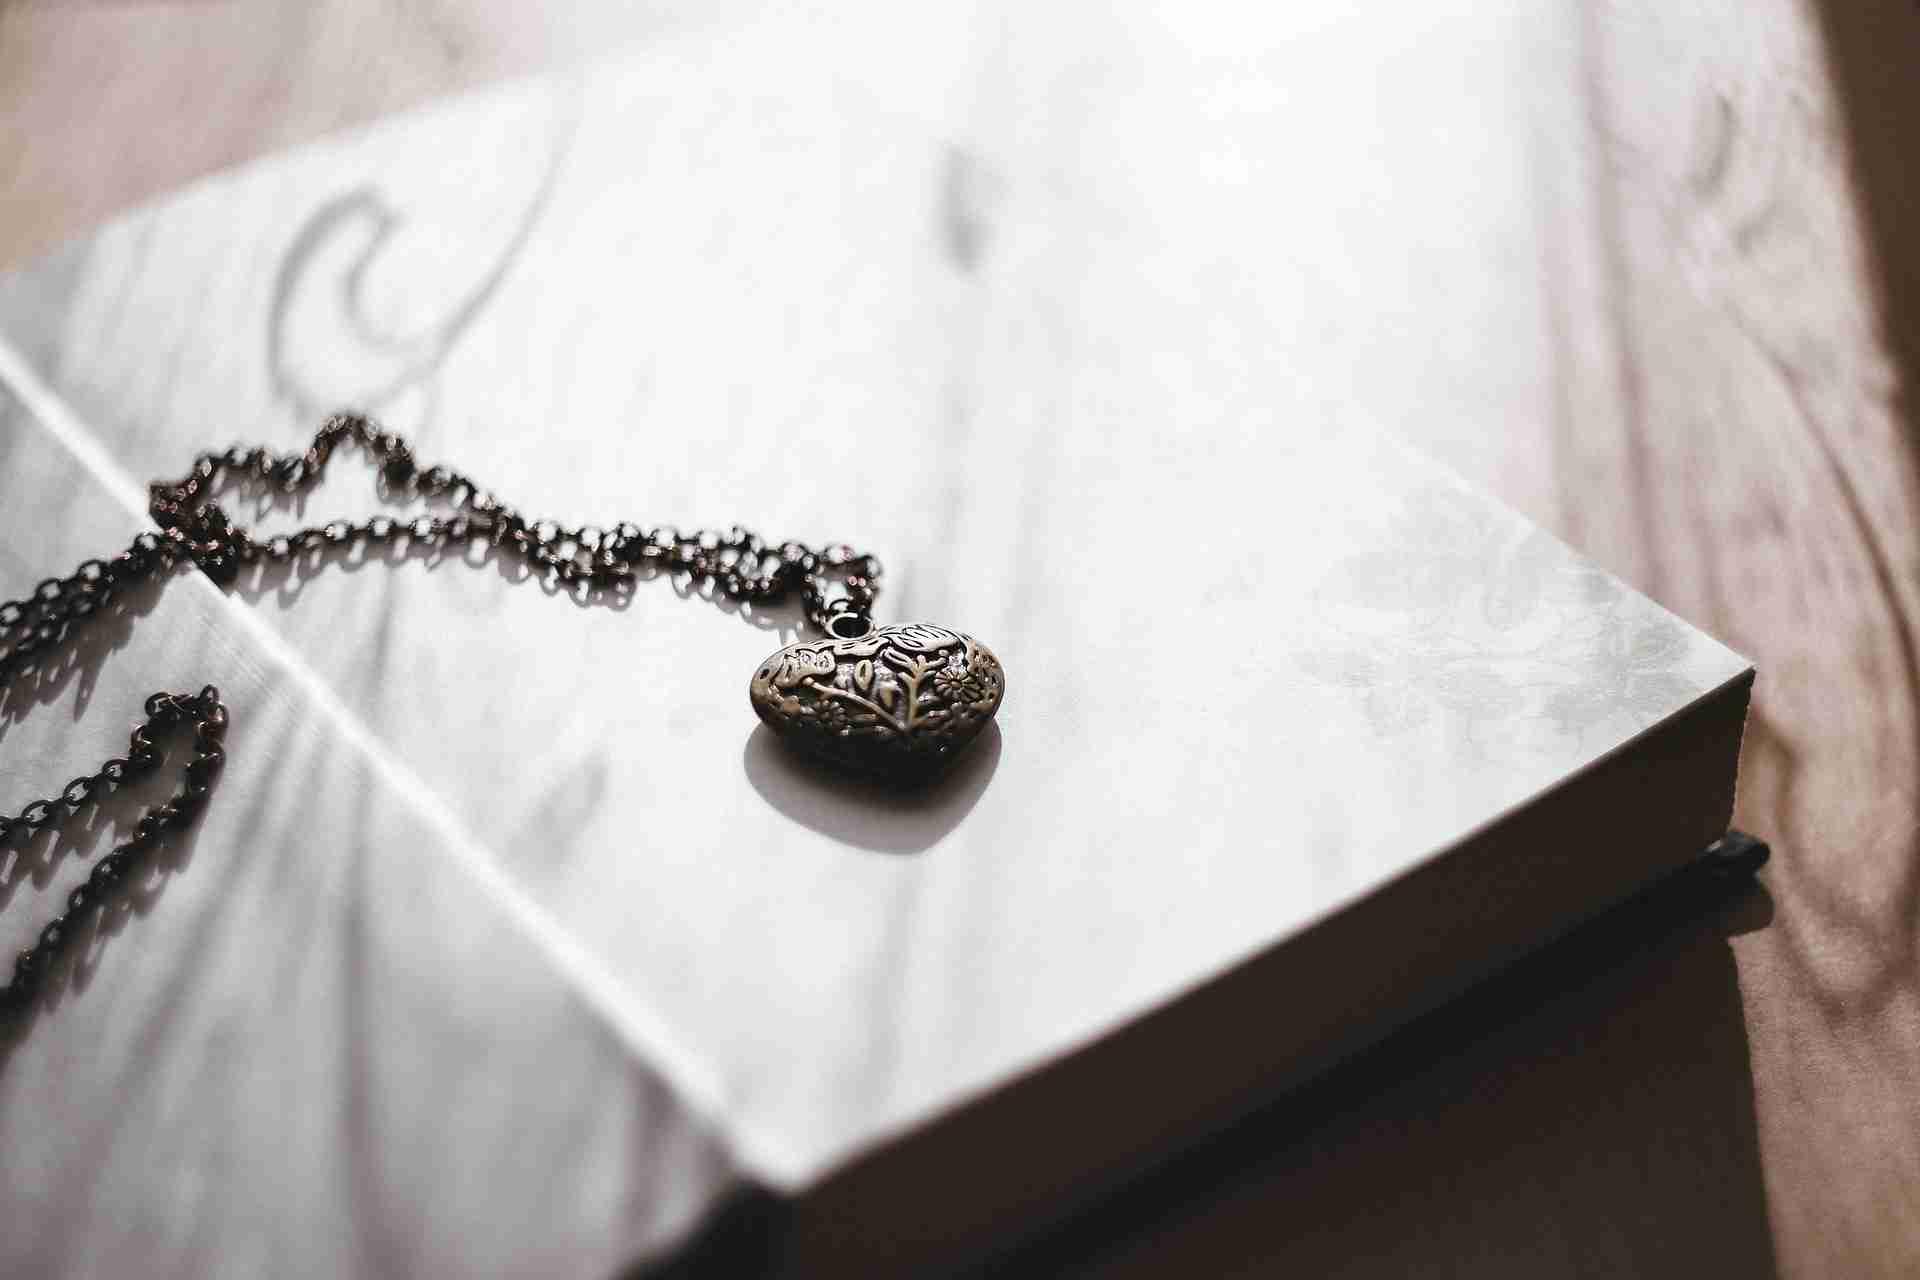 Halskette entknoten